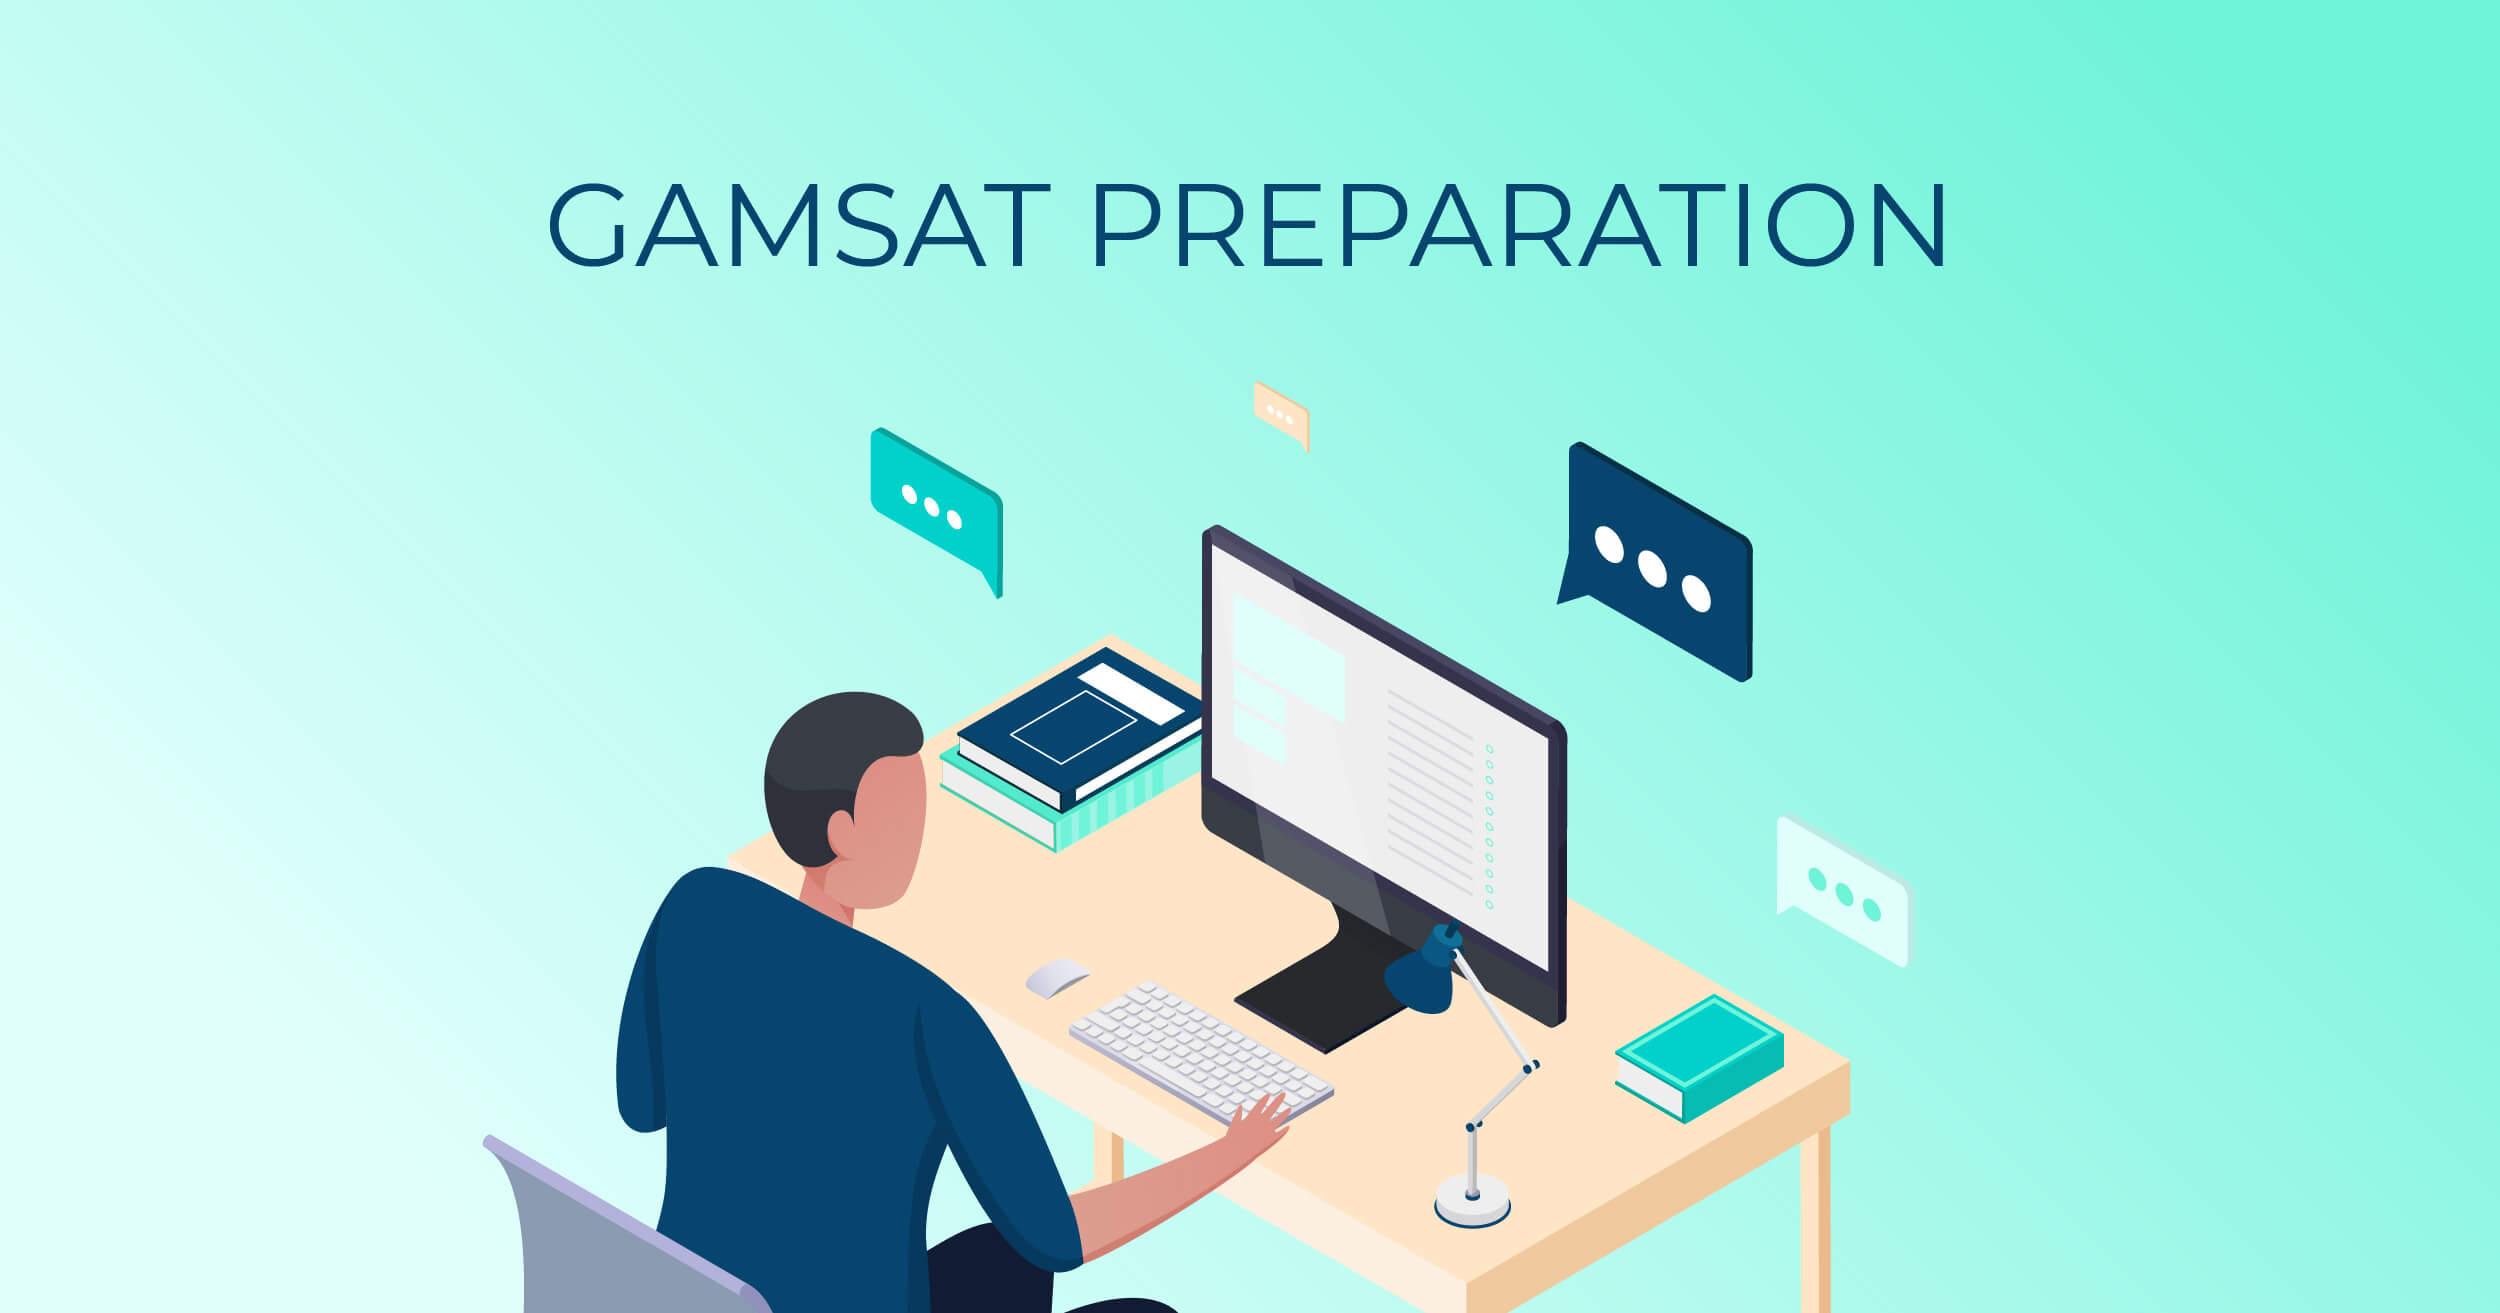 GAMSAT Preparation featured image